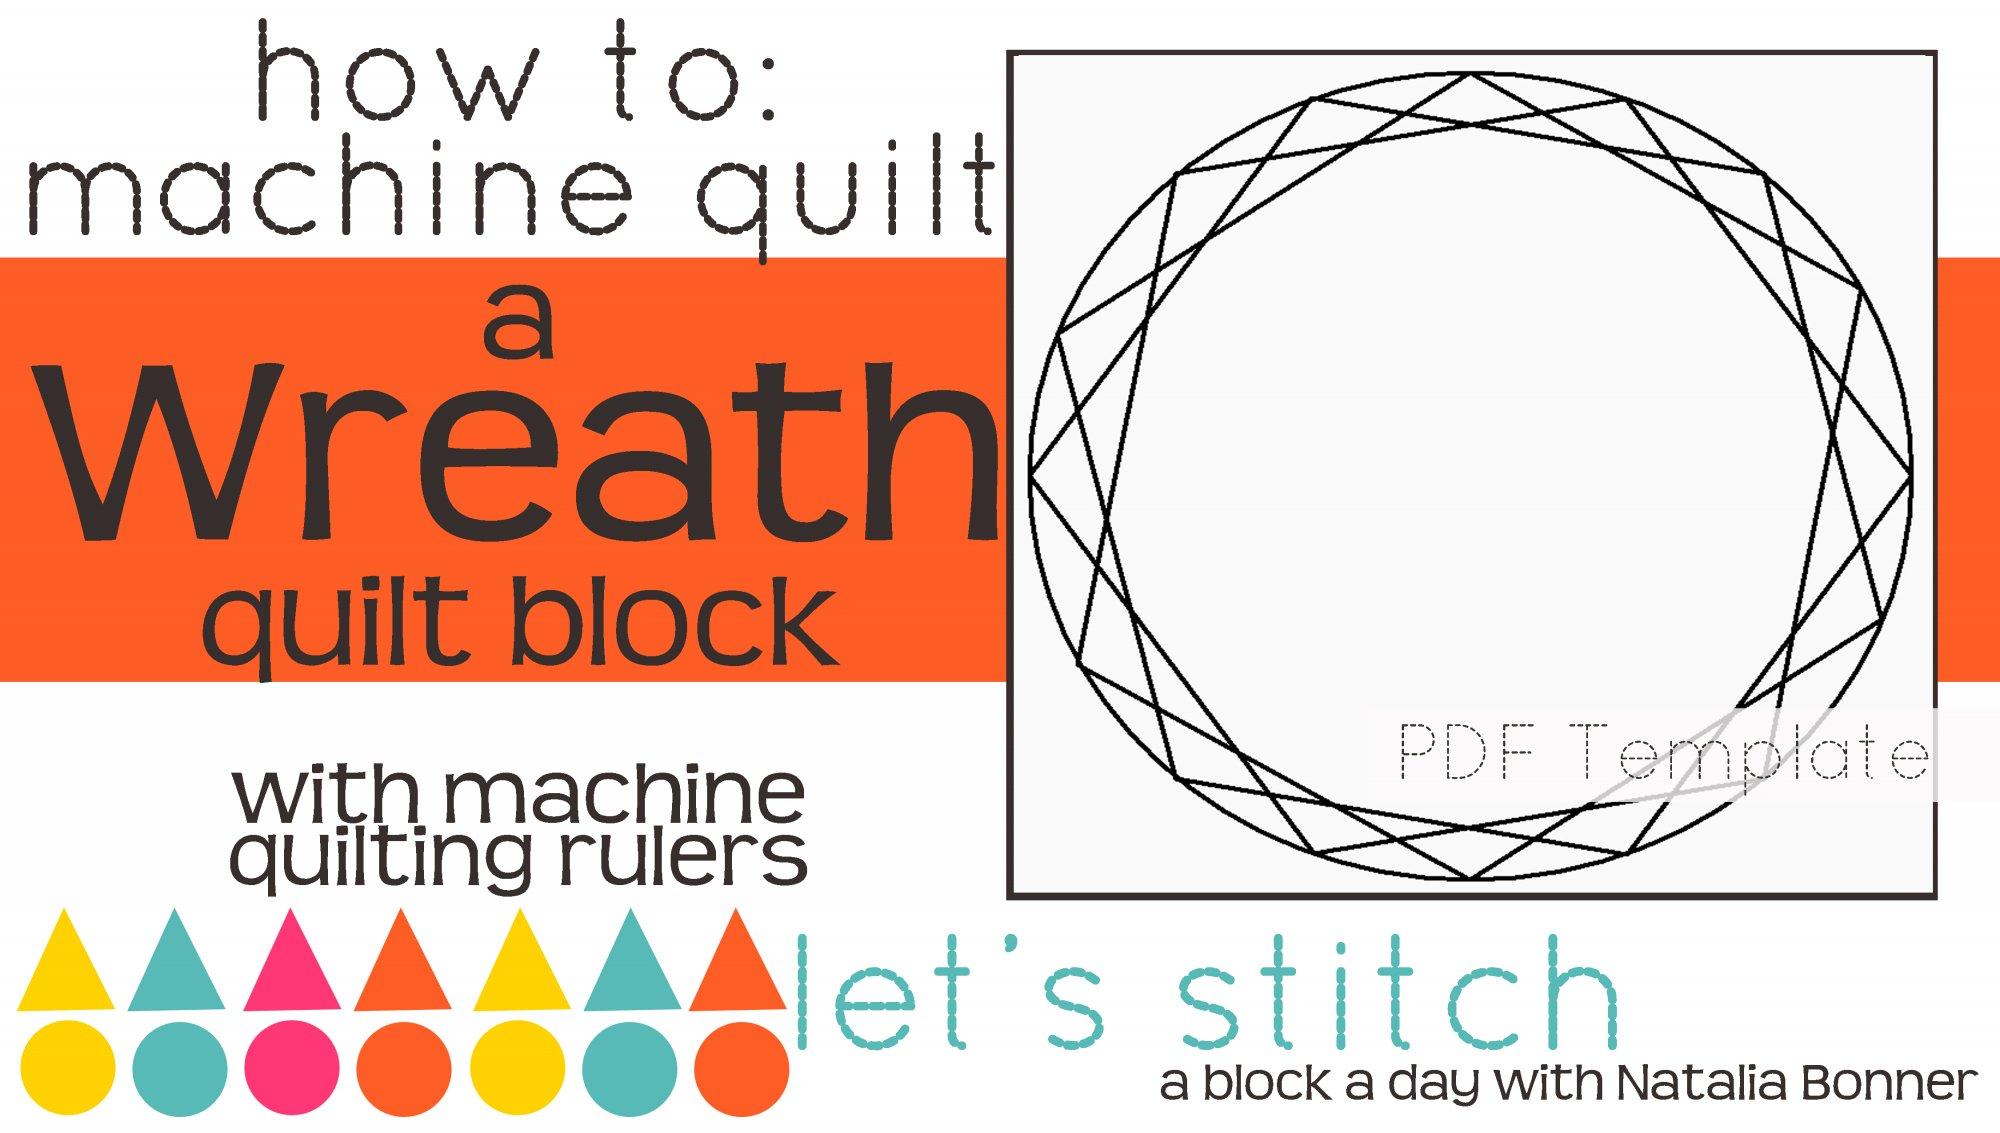 Let's Stitch - A Block a Day With Natalia Bonner - PDF - Wreath